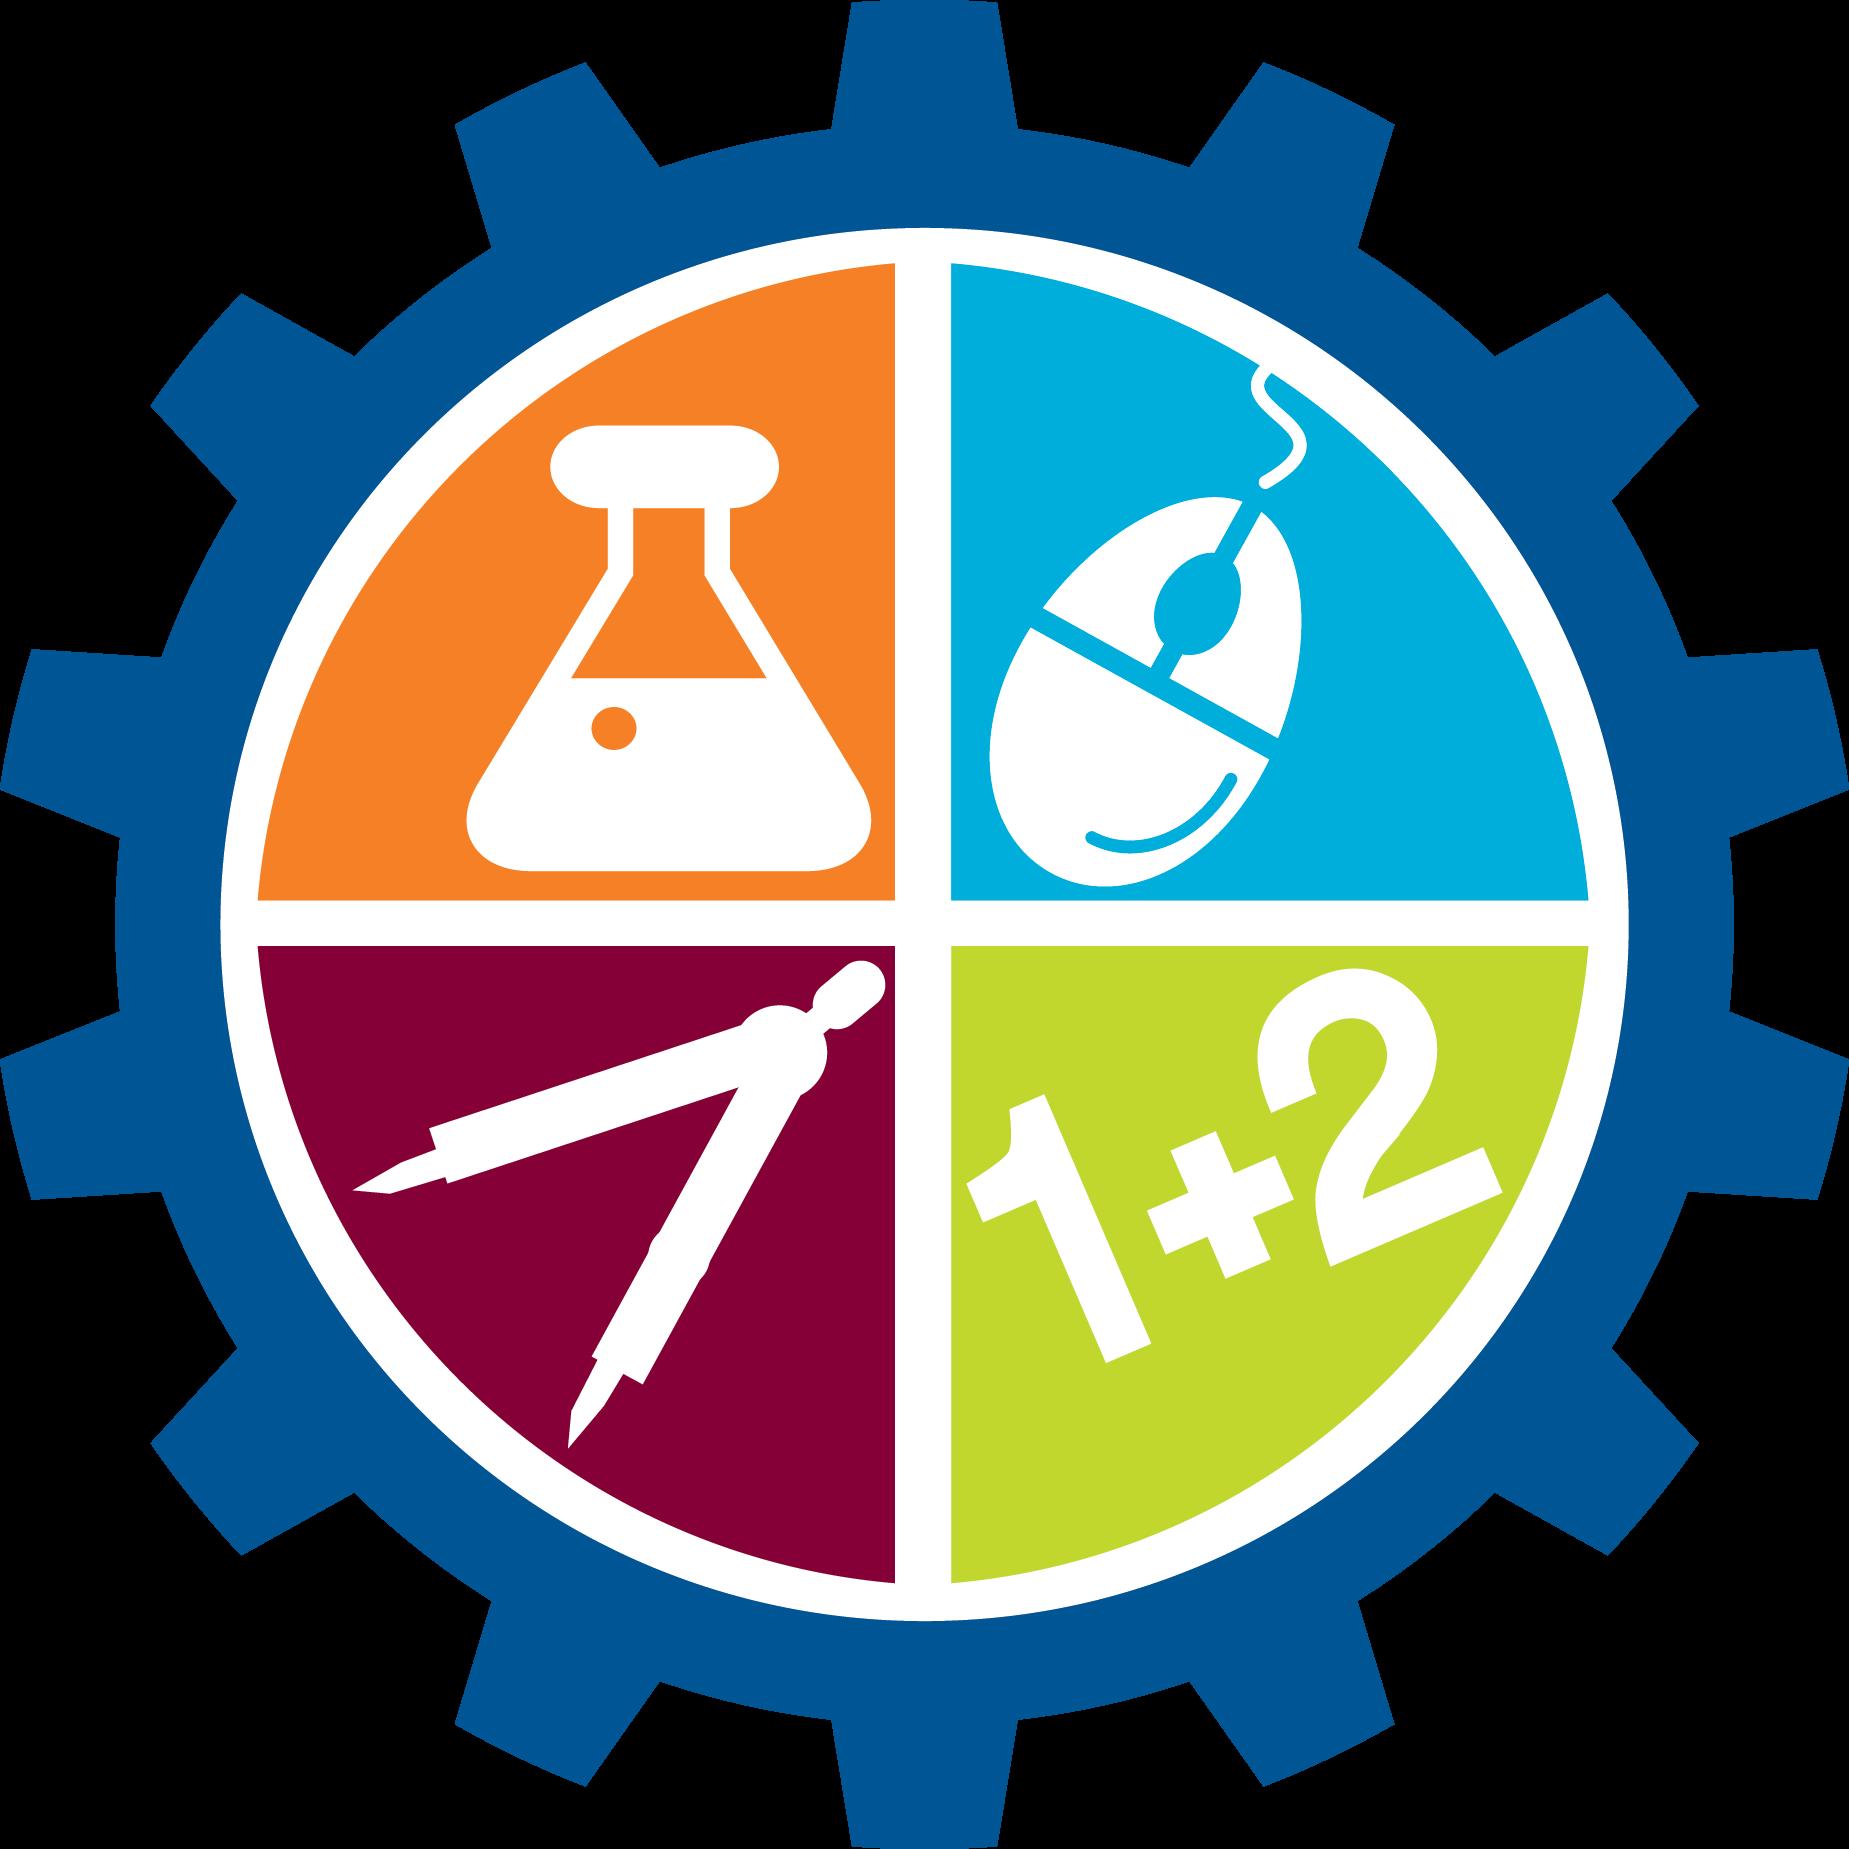 Stem Logos